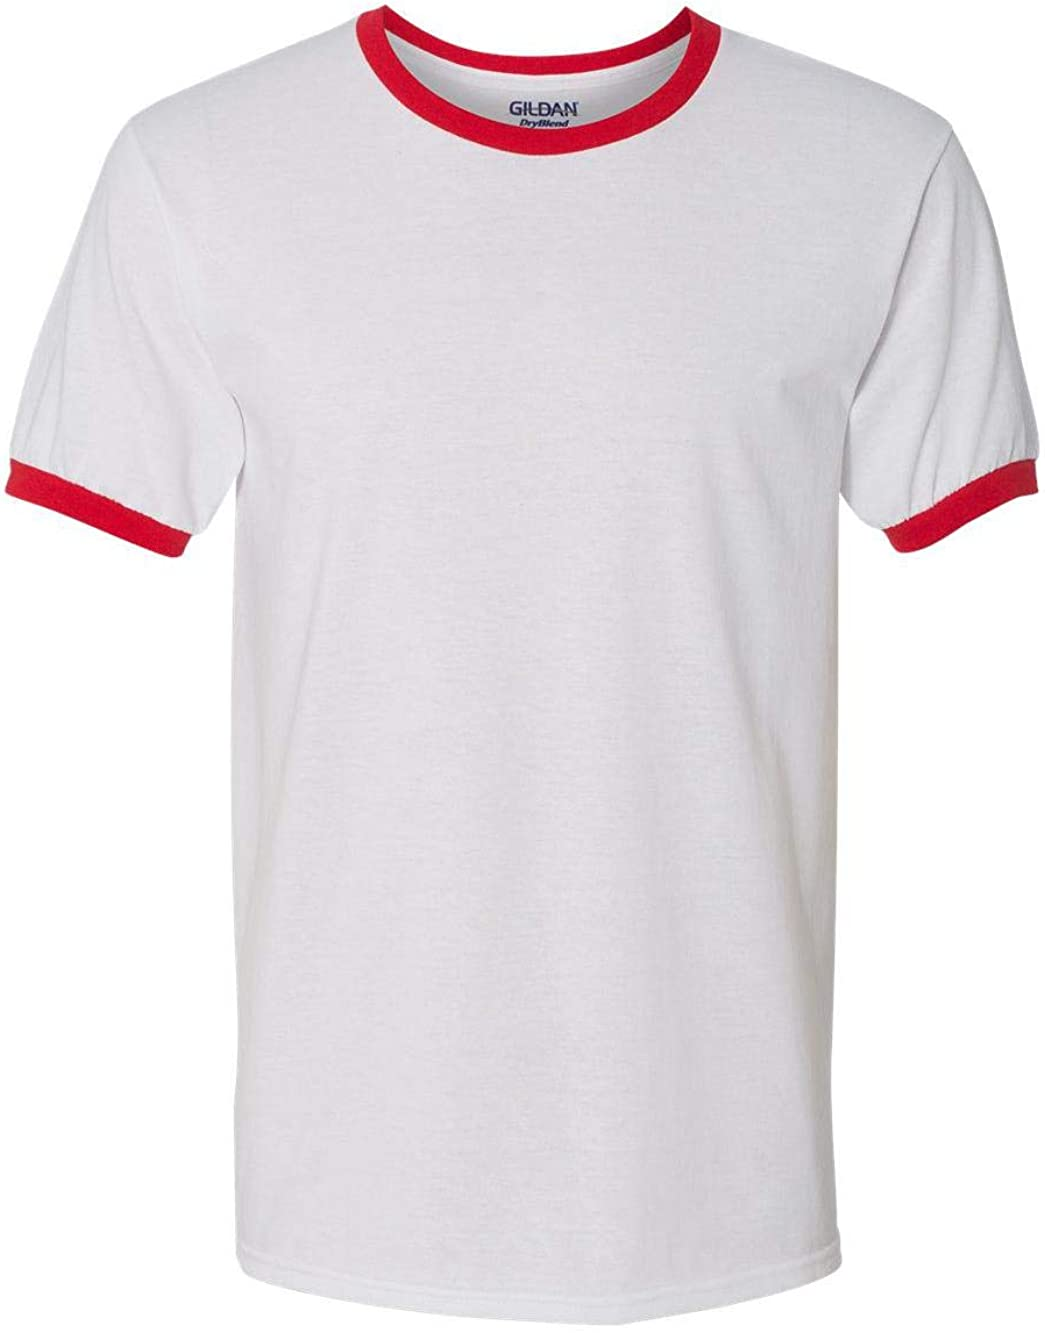 Gildan Men's DryBlend Preshrunk Contrast Neck T-Shirt